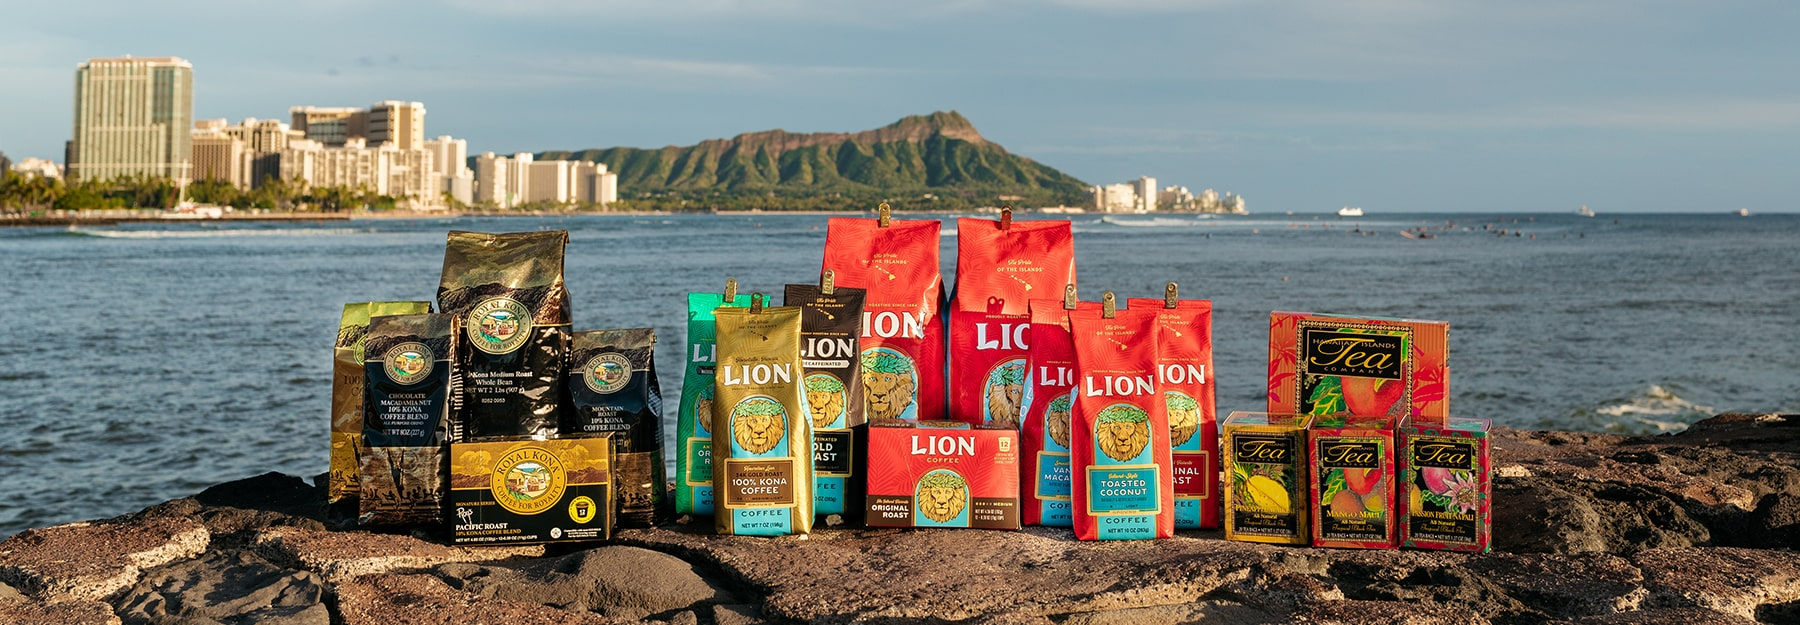 Hawaii Coffee Company Products